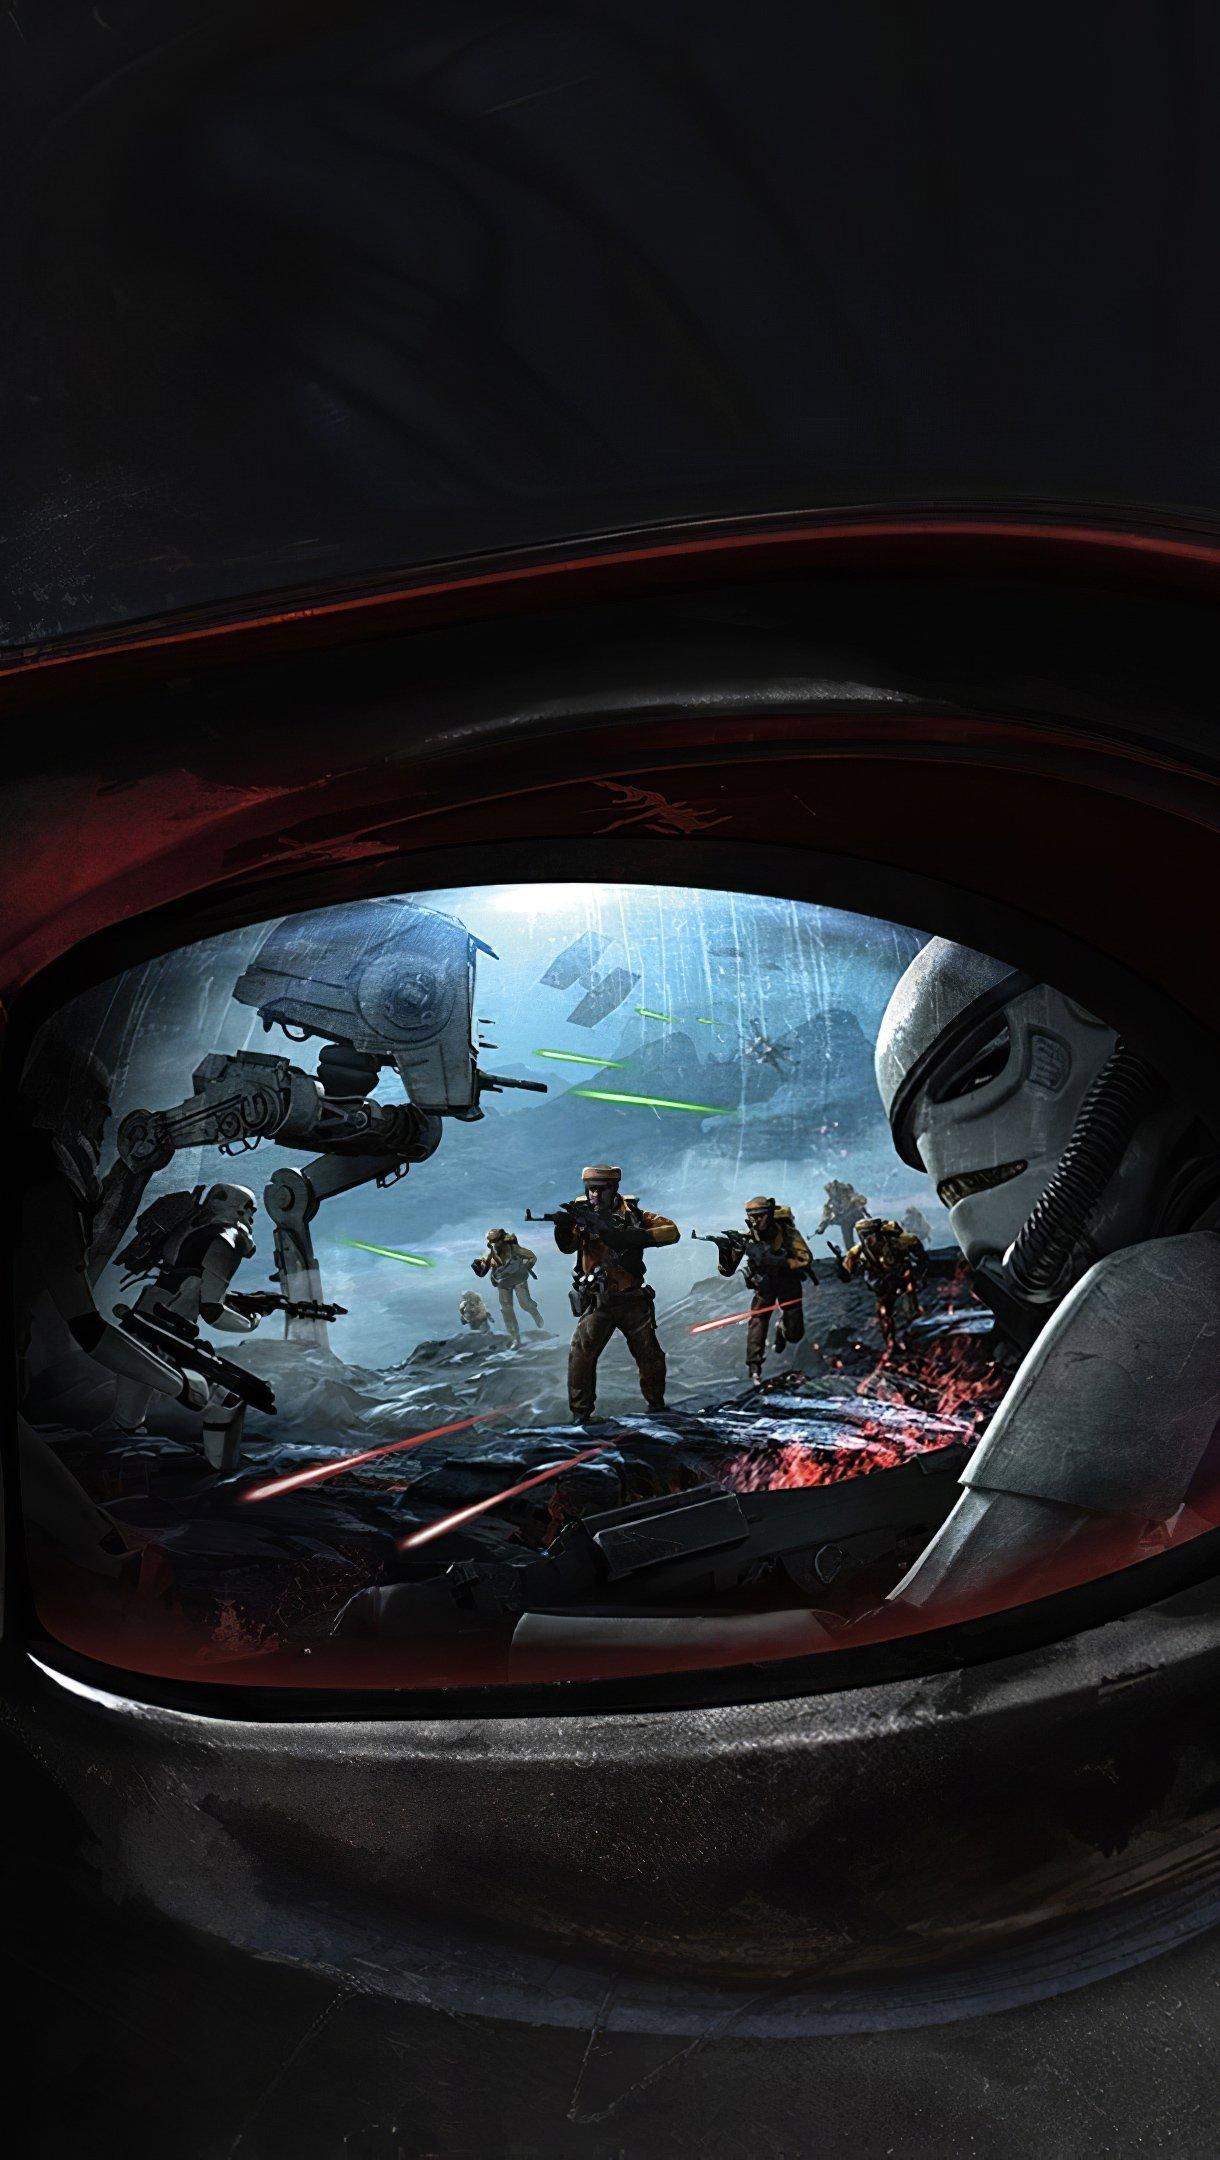 Wallpaper Darth Vader from Star Wars Battlefront Vertical